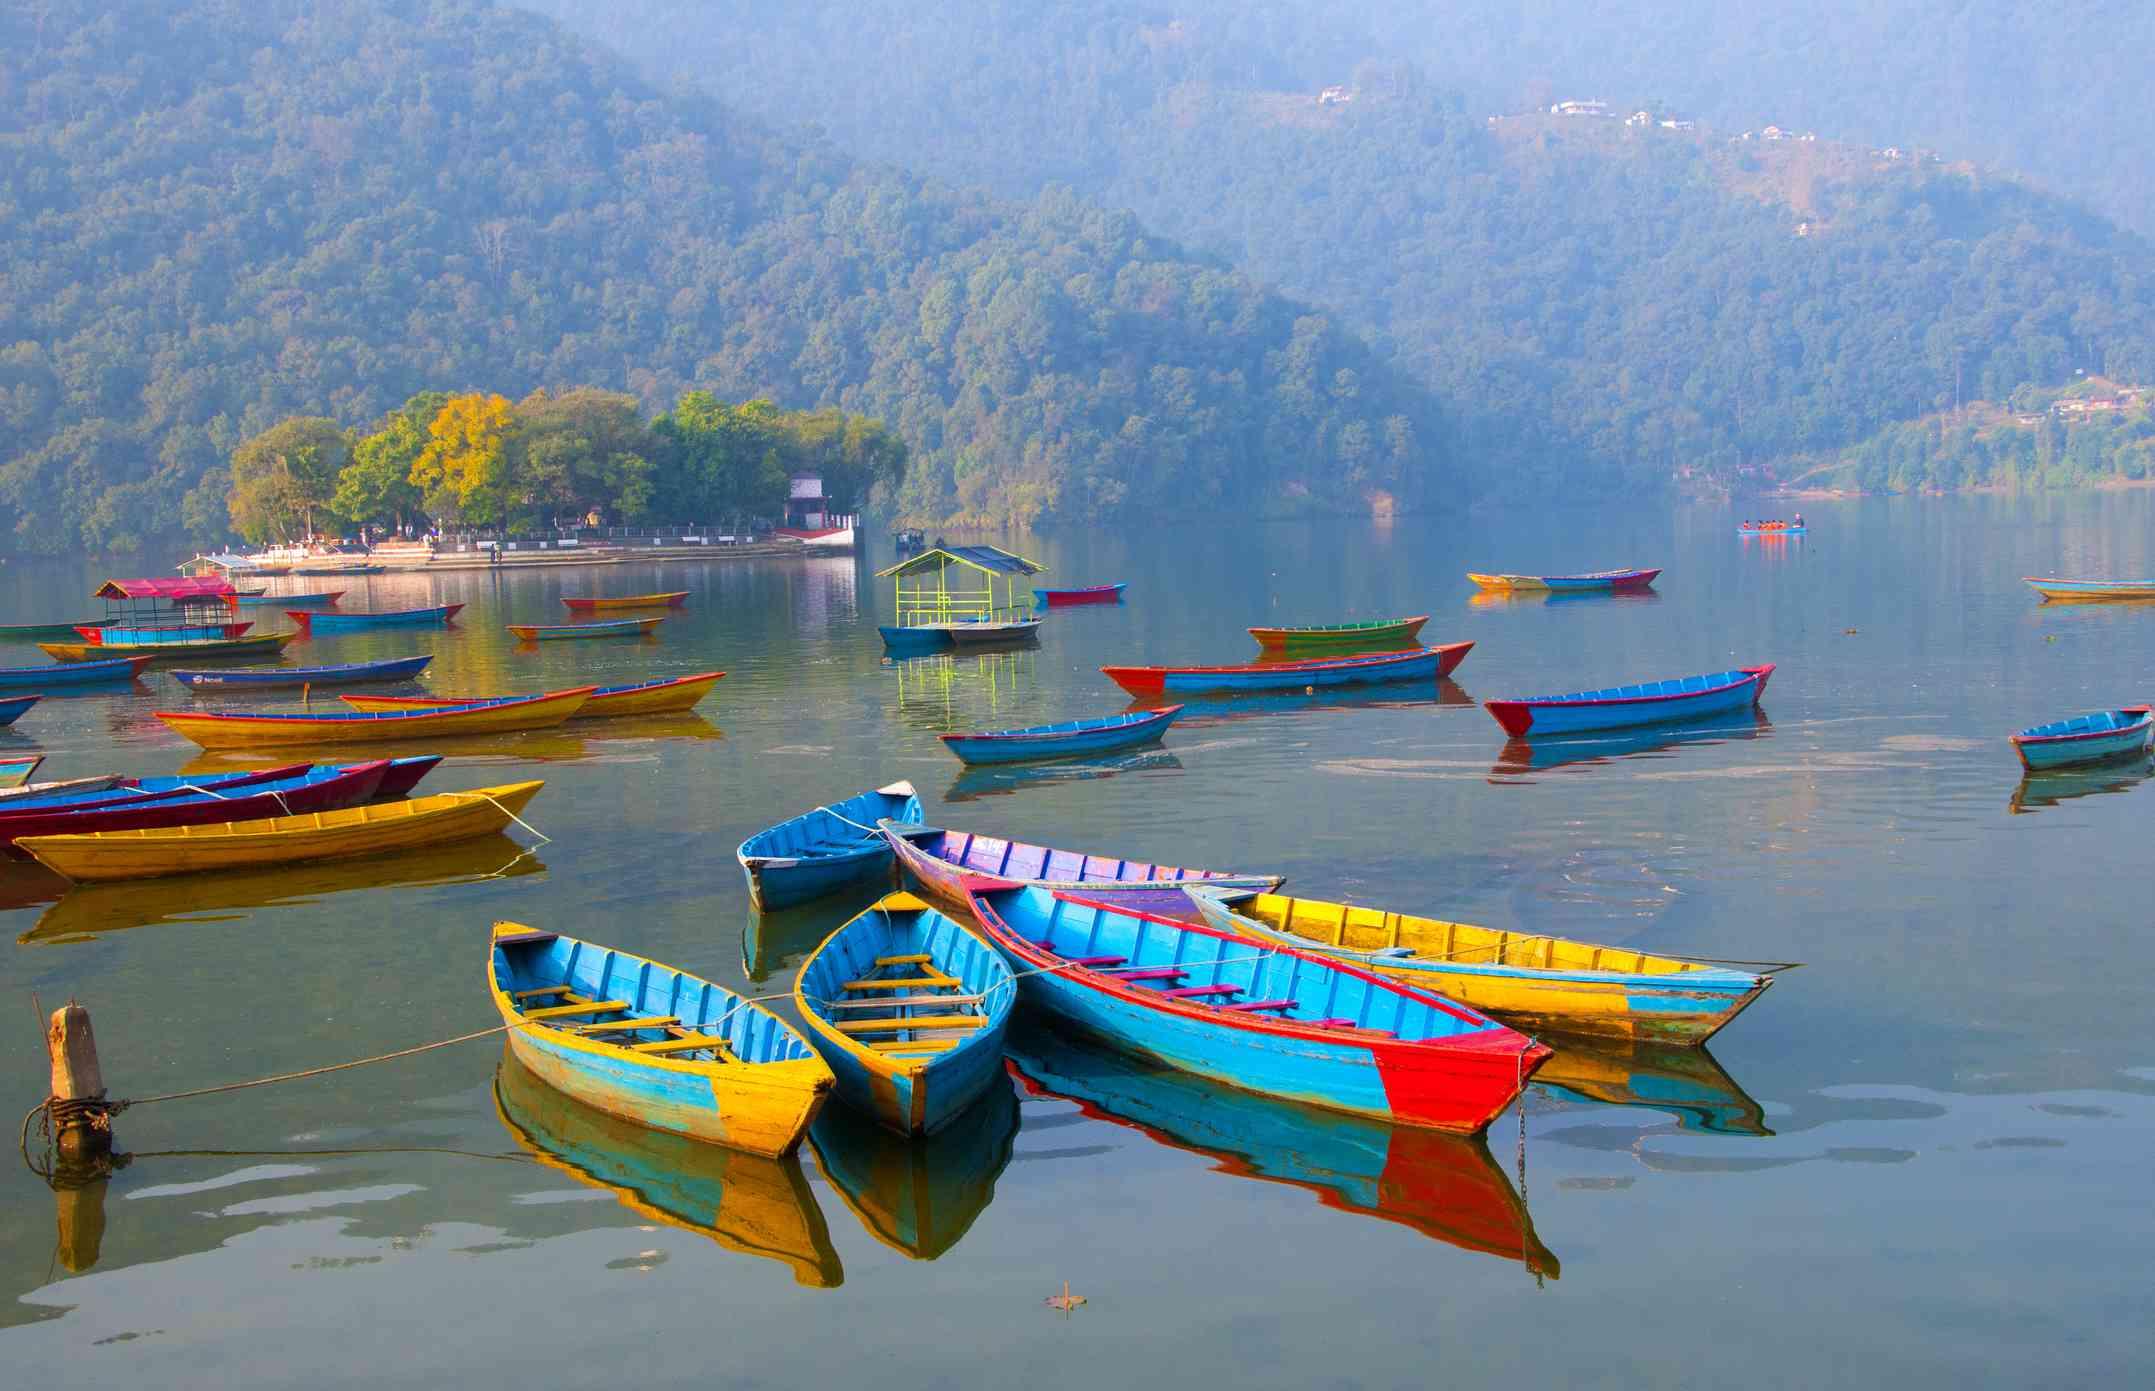 Colourful Wooden pleasure boats in Phewa Lake, Pokhara, Nepal